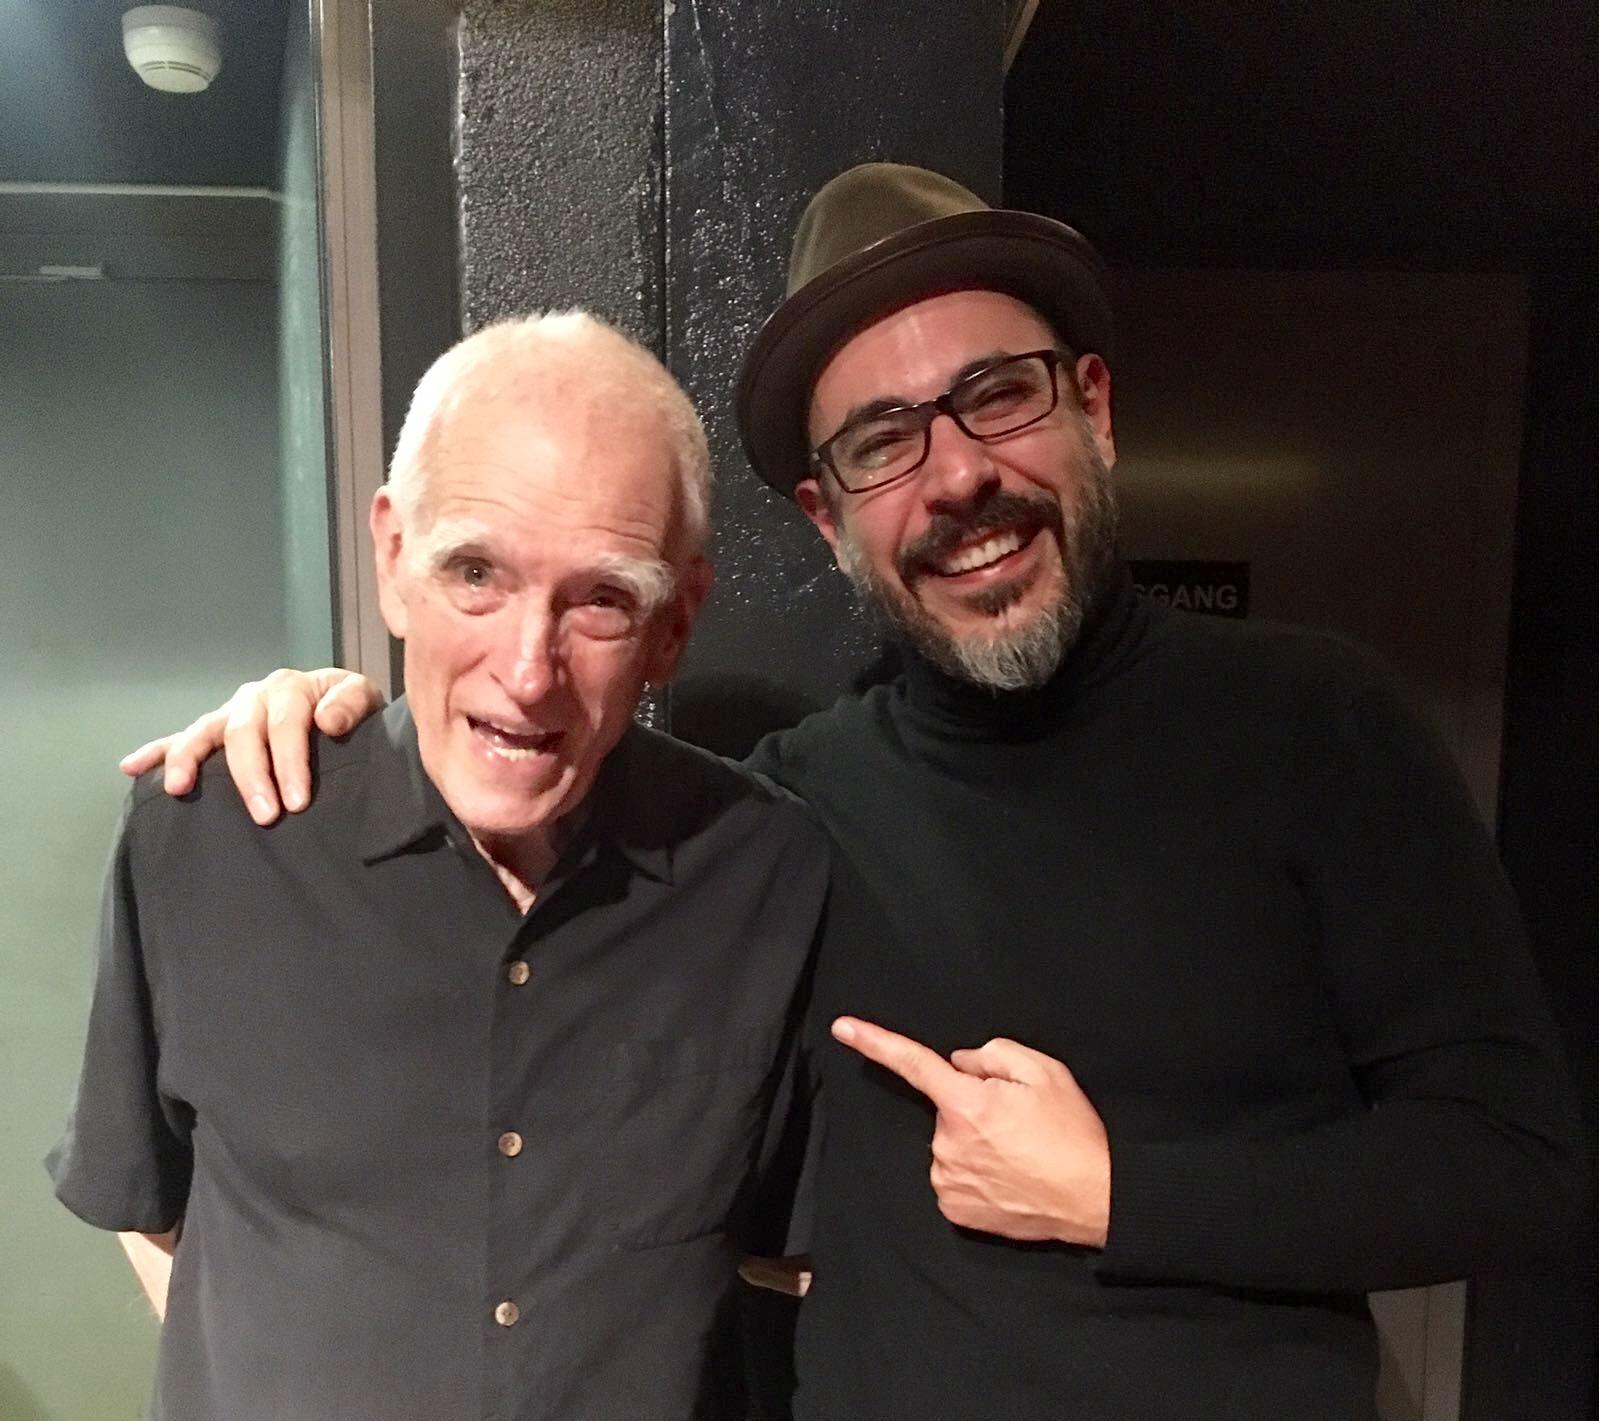 with Steve!